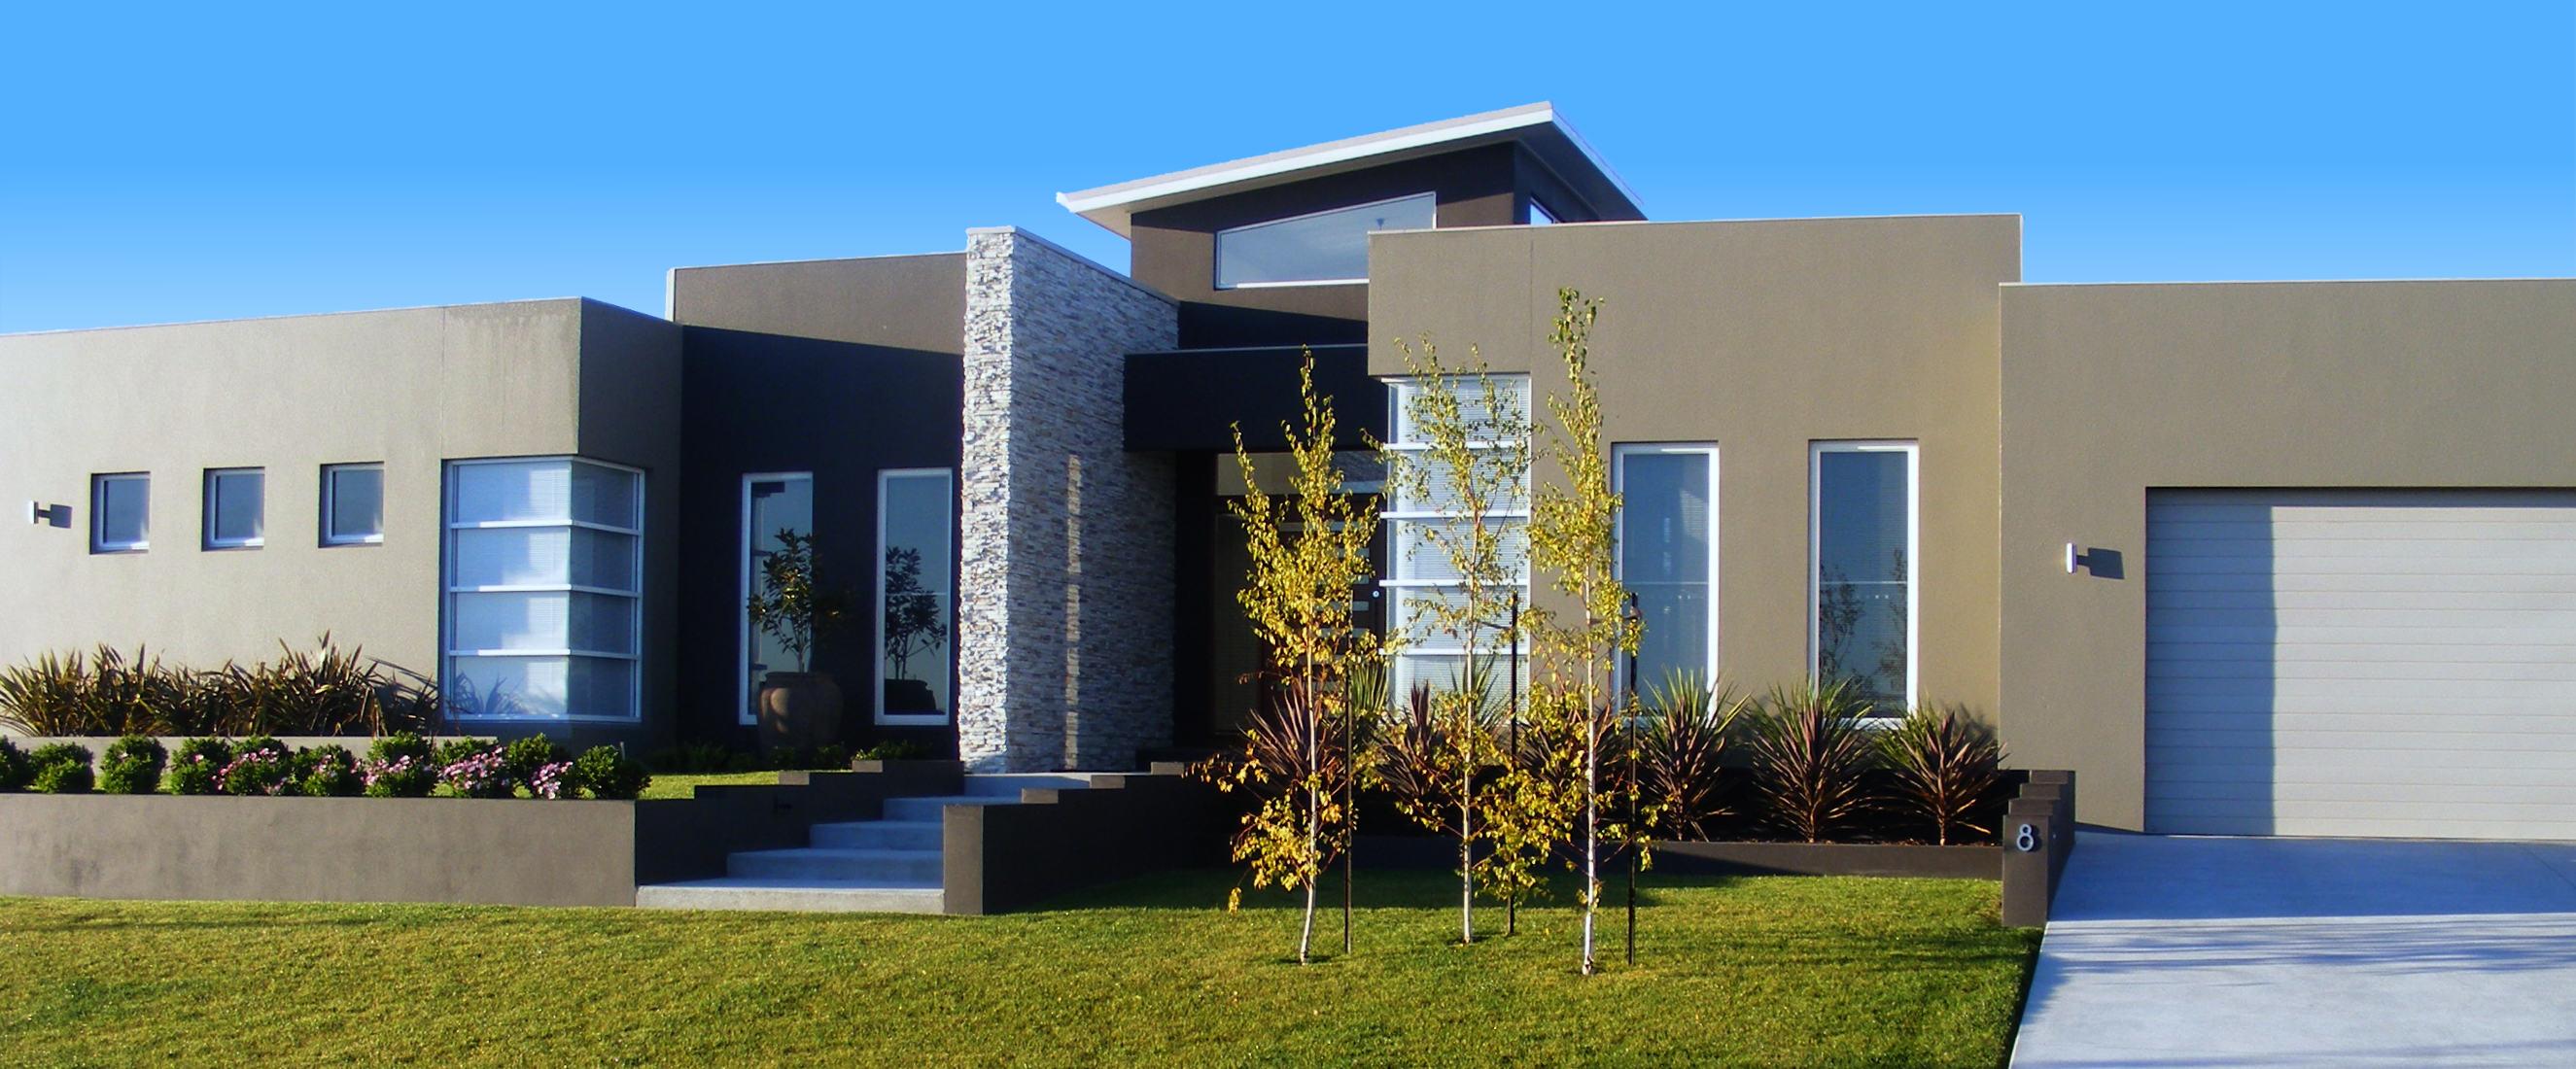 Marple Constructions Home 7